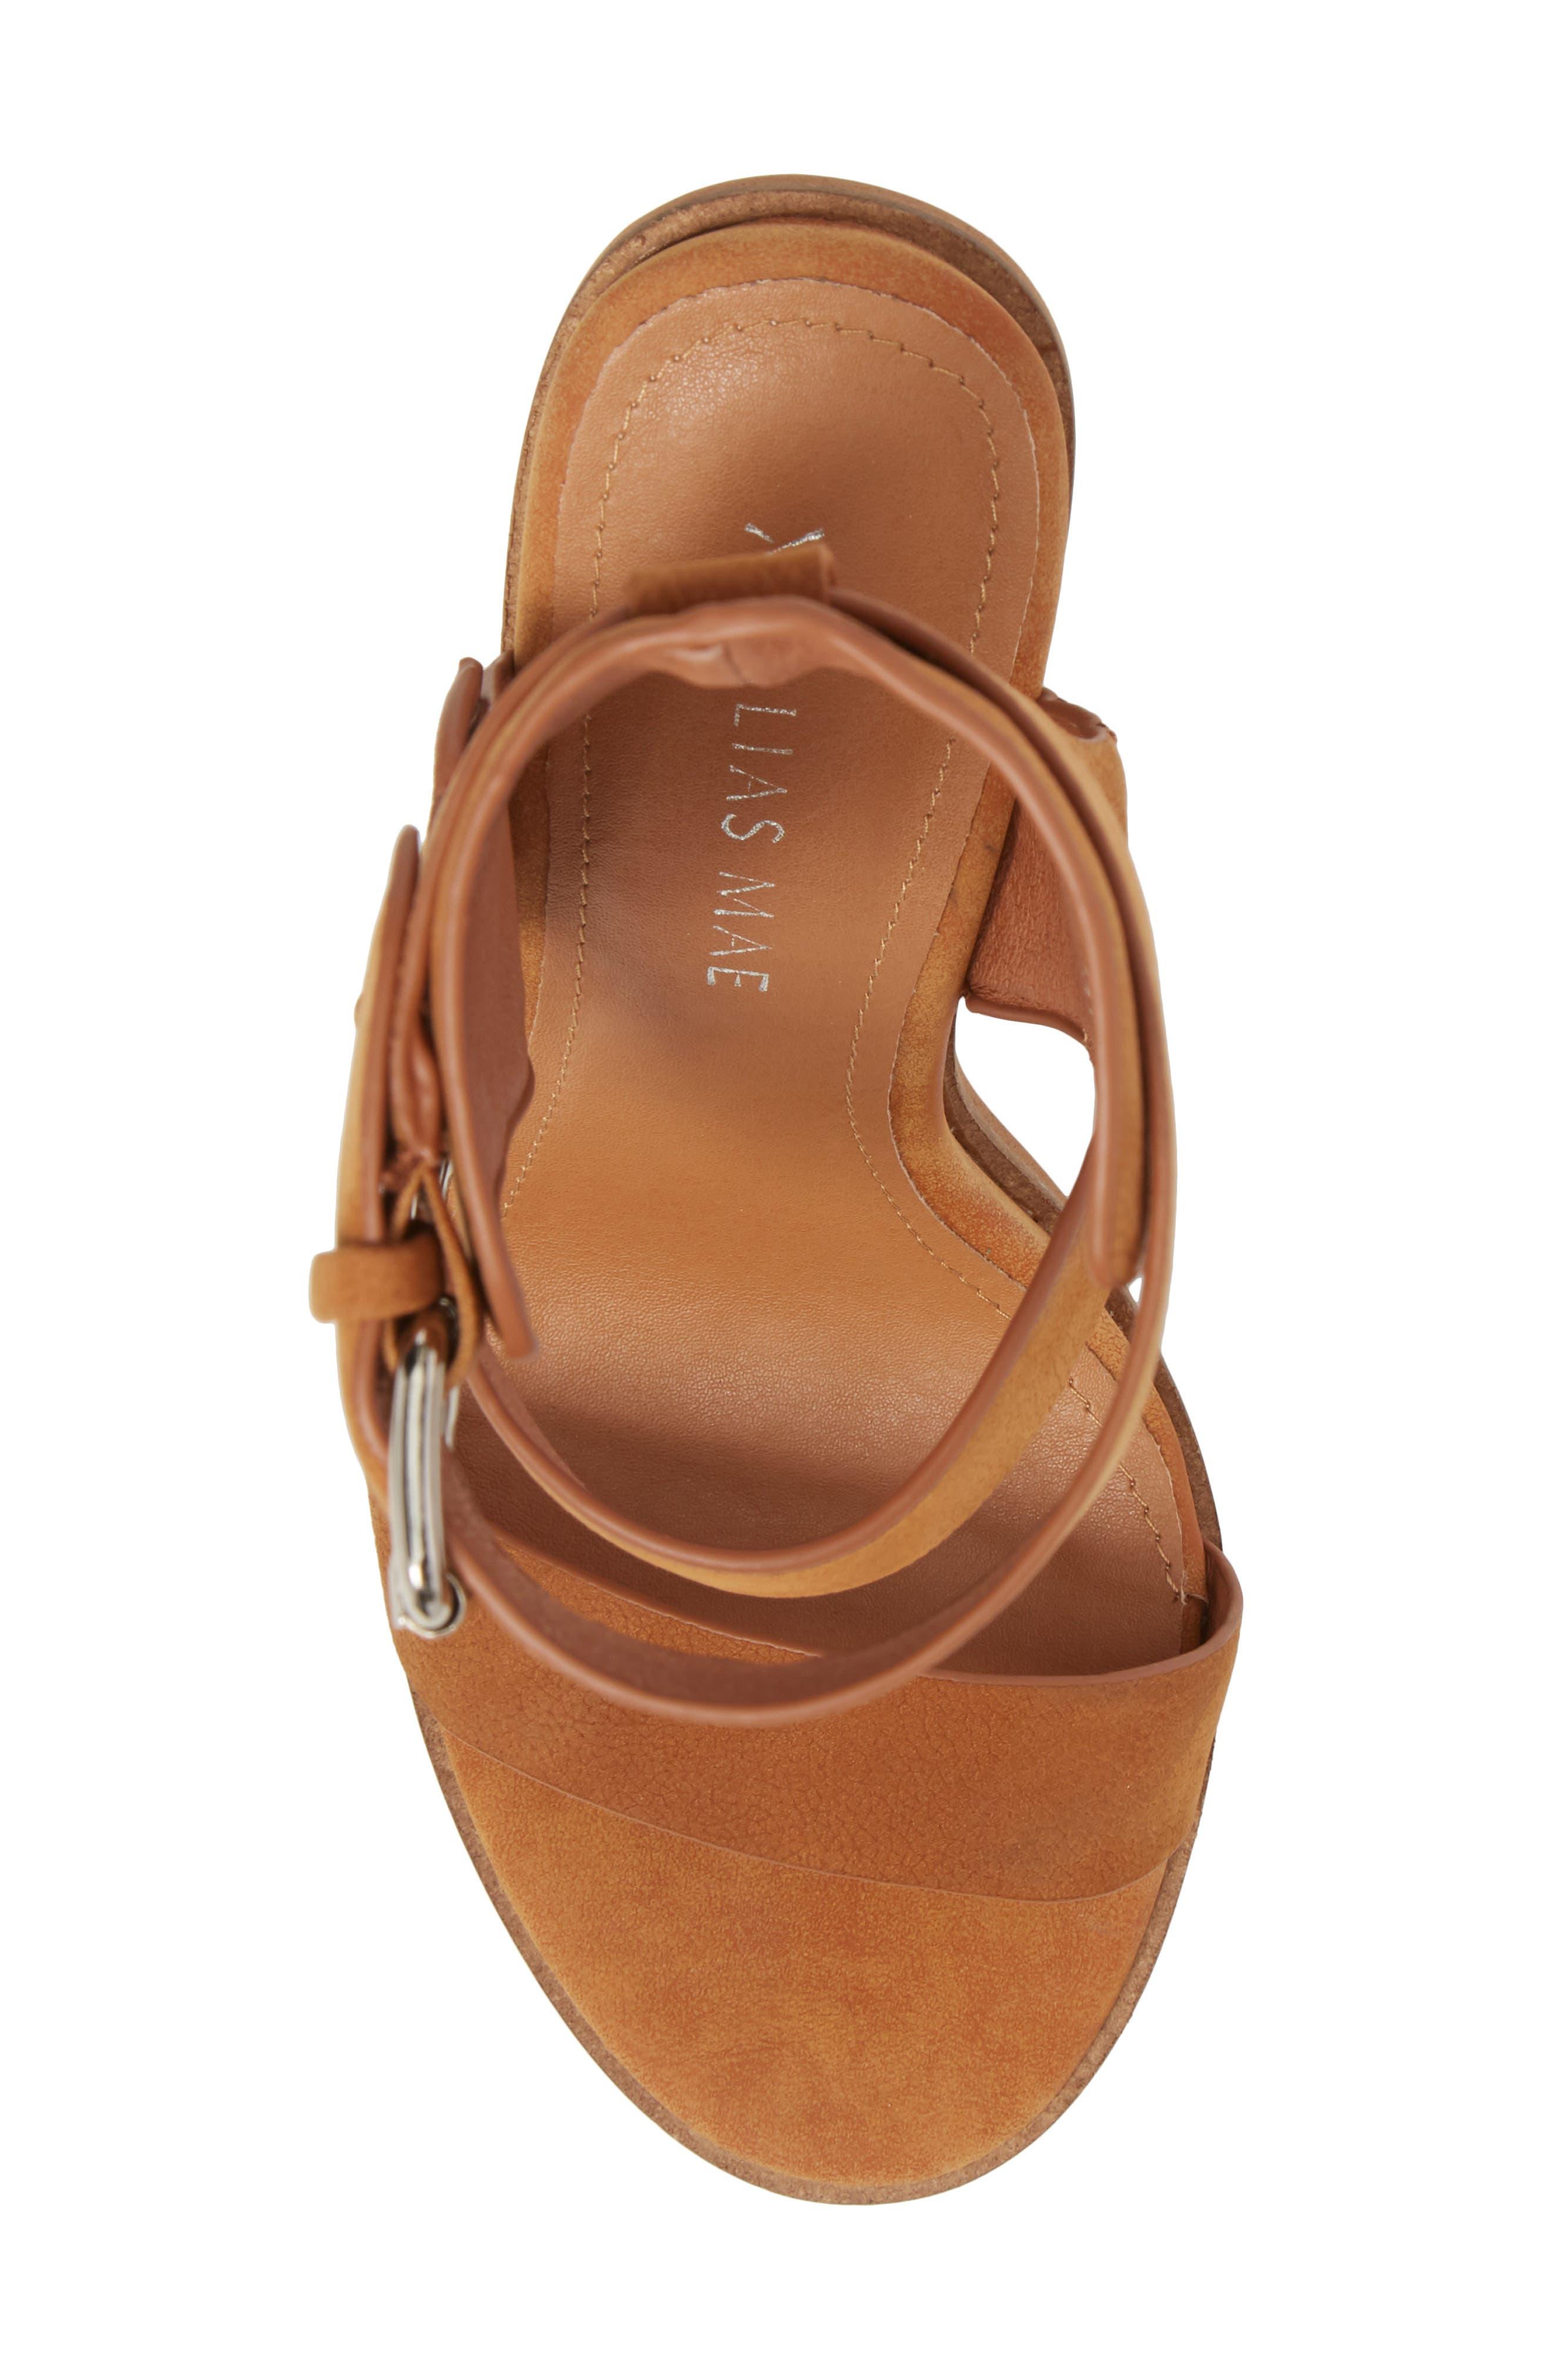 Abeba Block Heel Sandal,                             Alternate thumbnail 5, color,                             Tan Leather